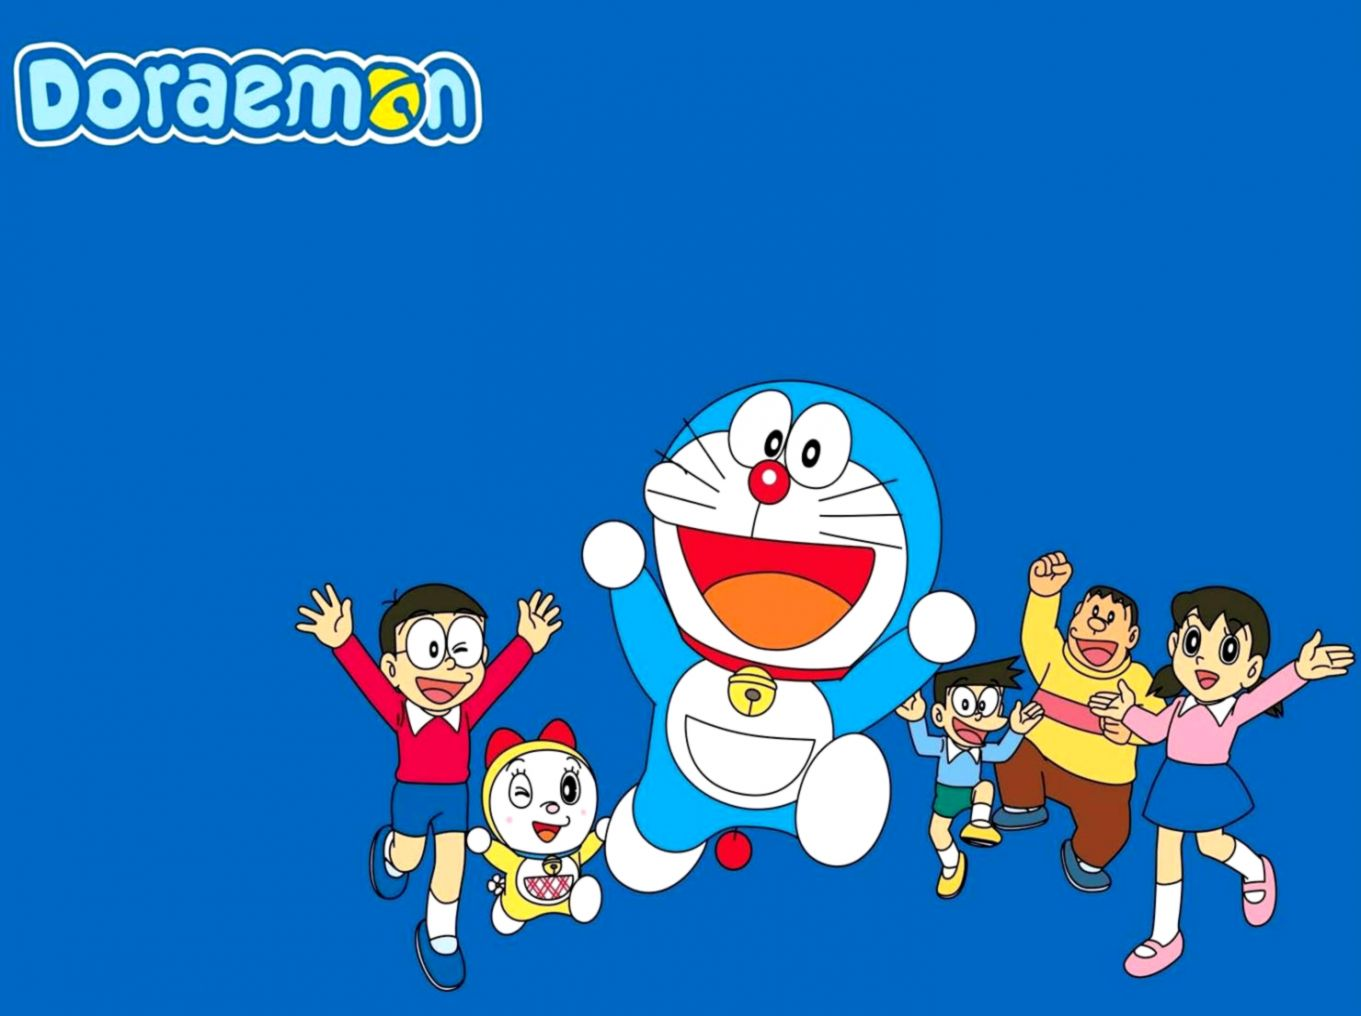 doraemon and nobita anime full screen hd wallpaper iphone